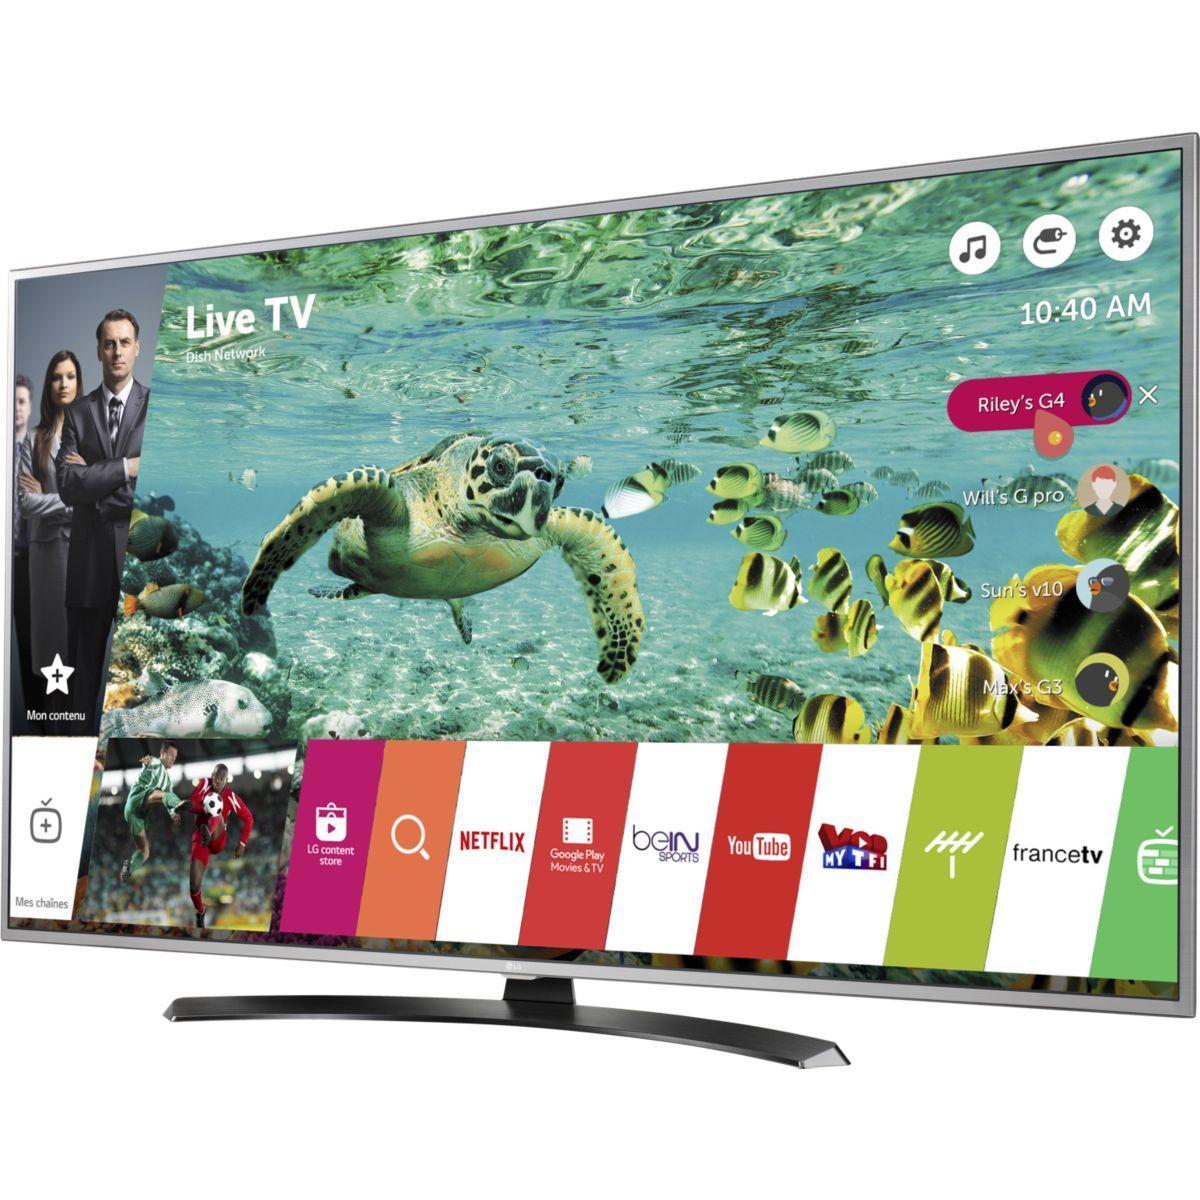 TV LG 43UH668V 100 PMI 4K SMART TV